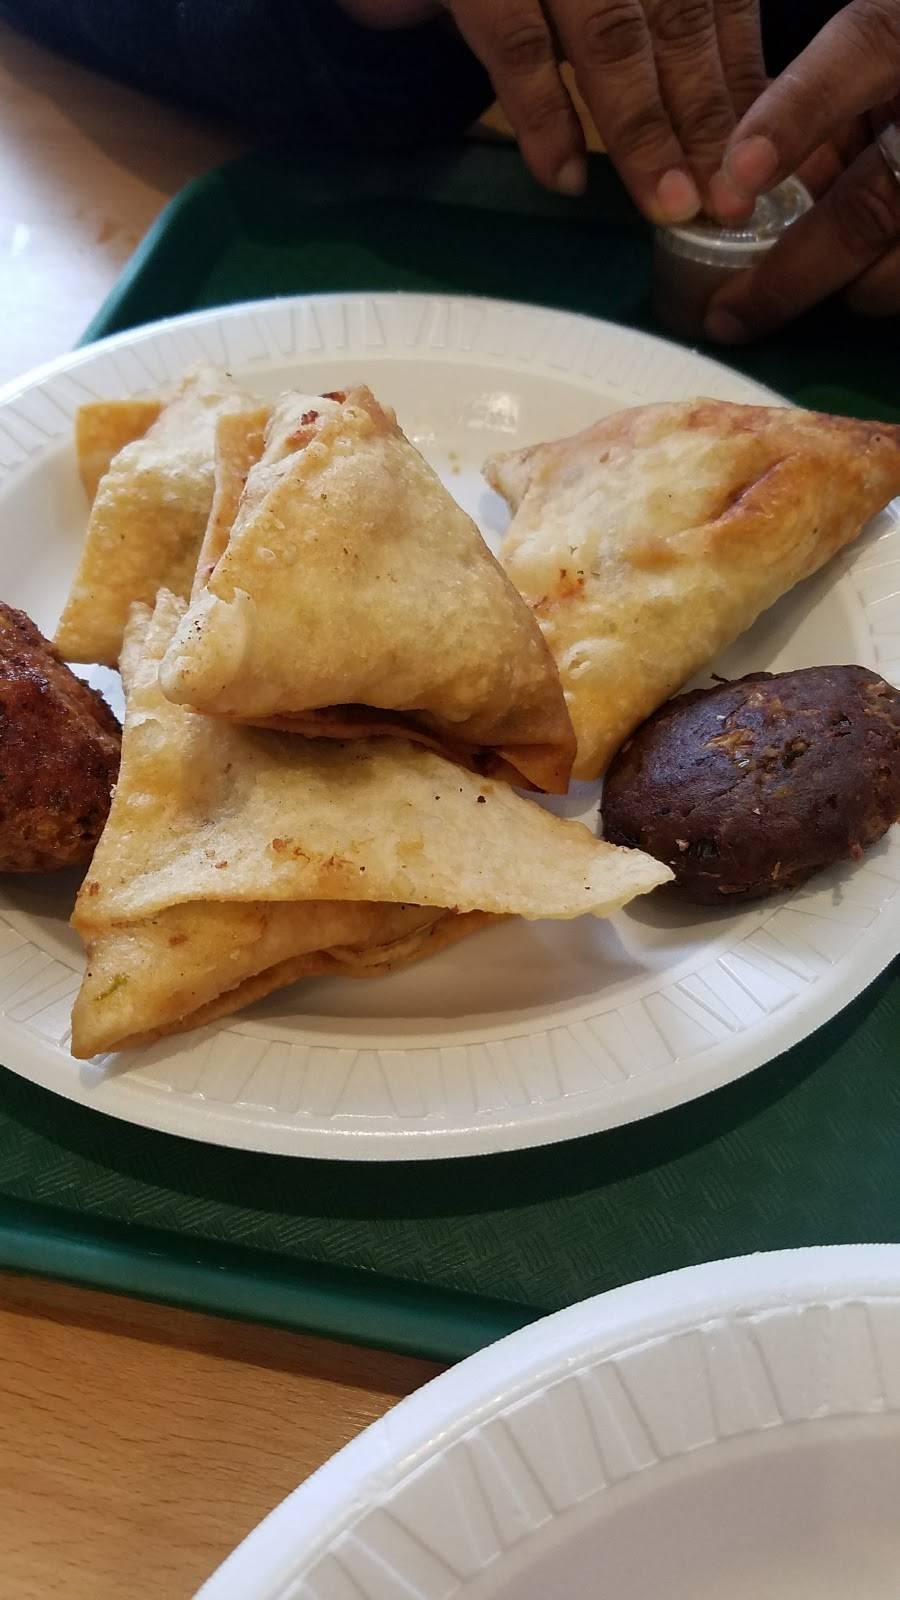 Aladdin Sweets | restaurant | 29-06 36th Ave, Astoria, NY 11106, USA | 7187842554 OR +1 718-784-2554